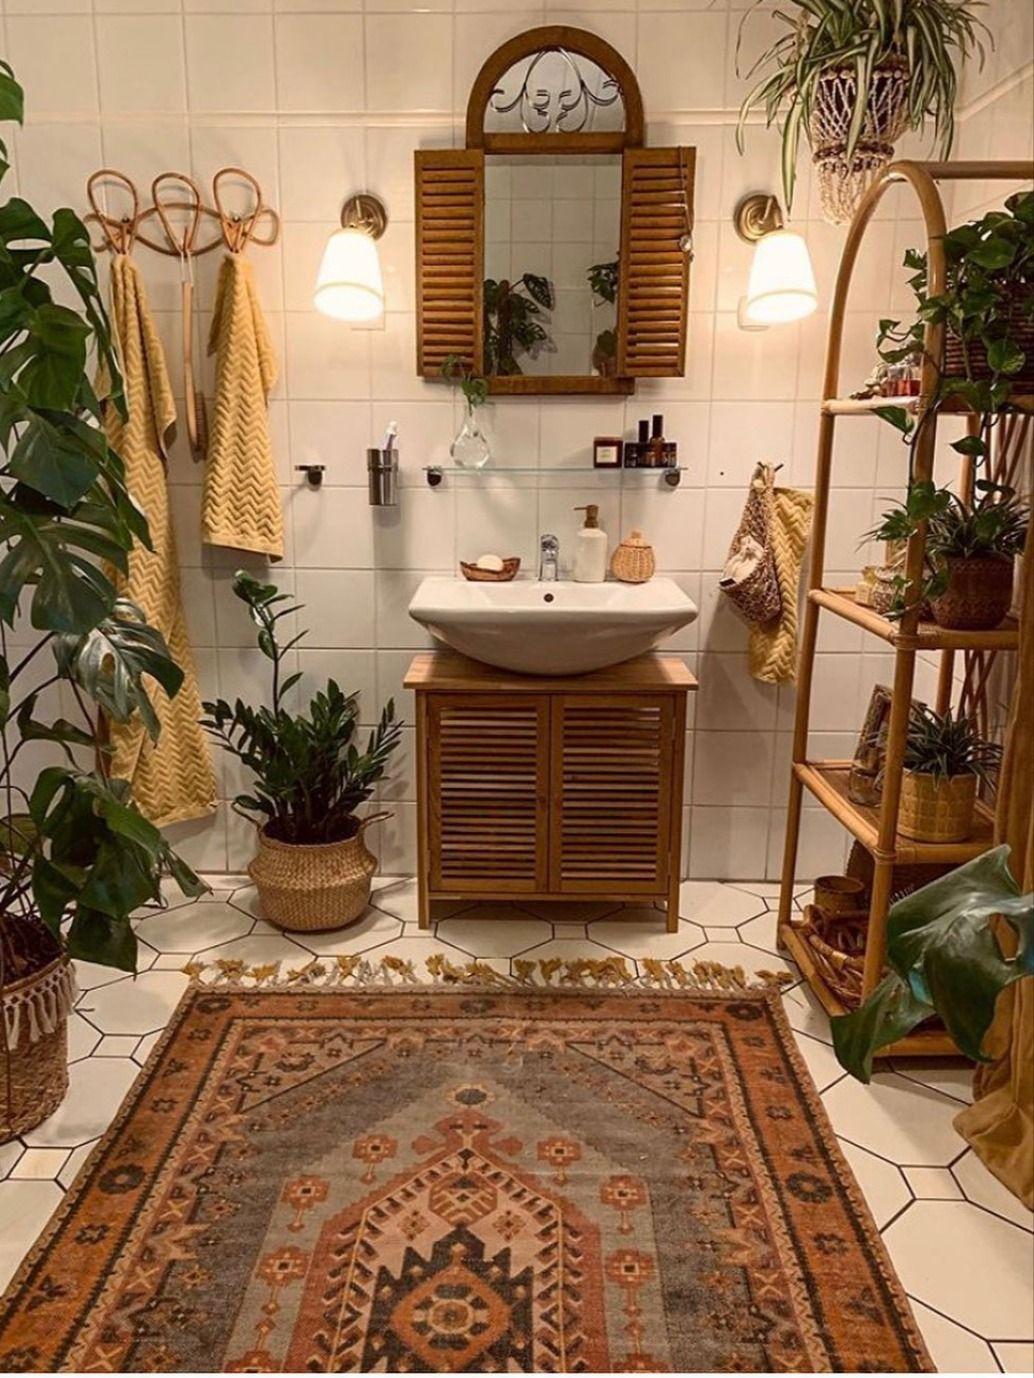 Interior Decor Living Room Decor Room Decor Patio Decor Boho Decor In 2021 Home Decor Inspiration Boho Bathroom Decor Boho Bathroom Home decor dream decorate small bathroom